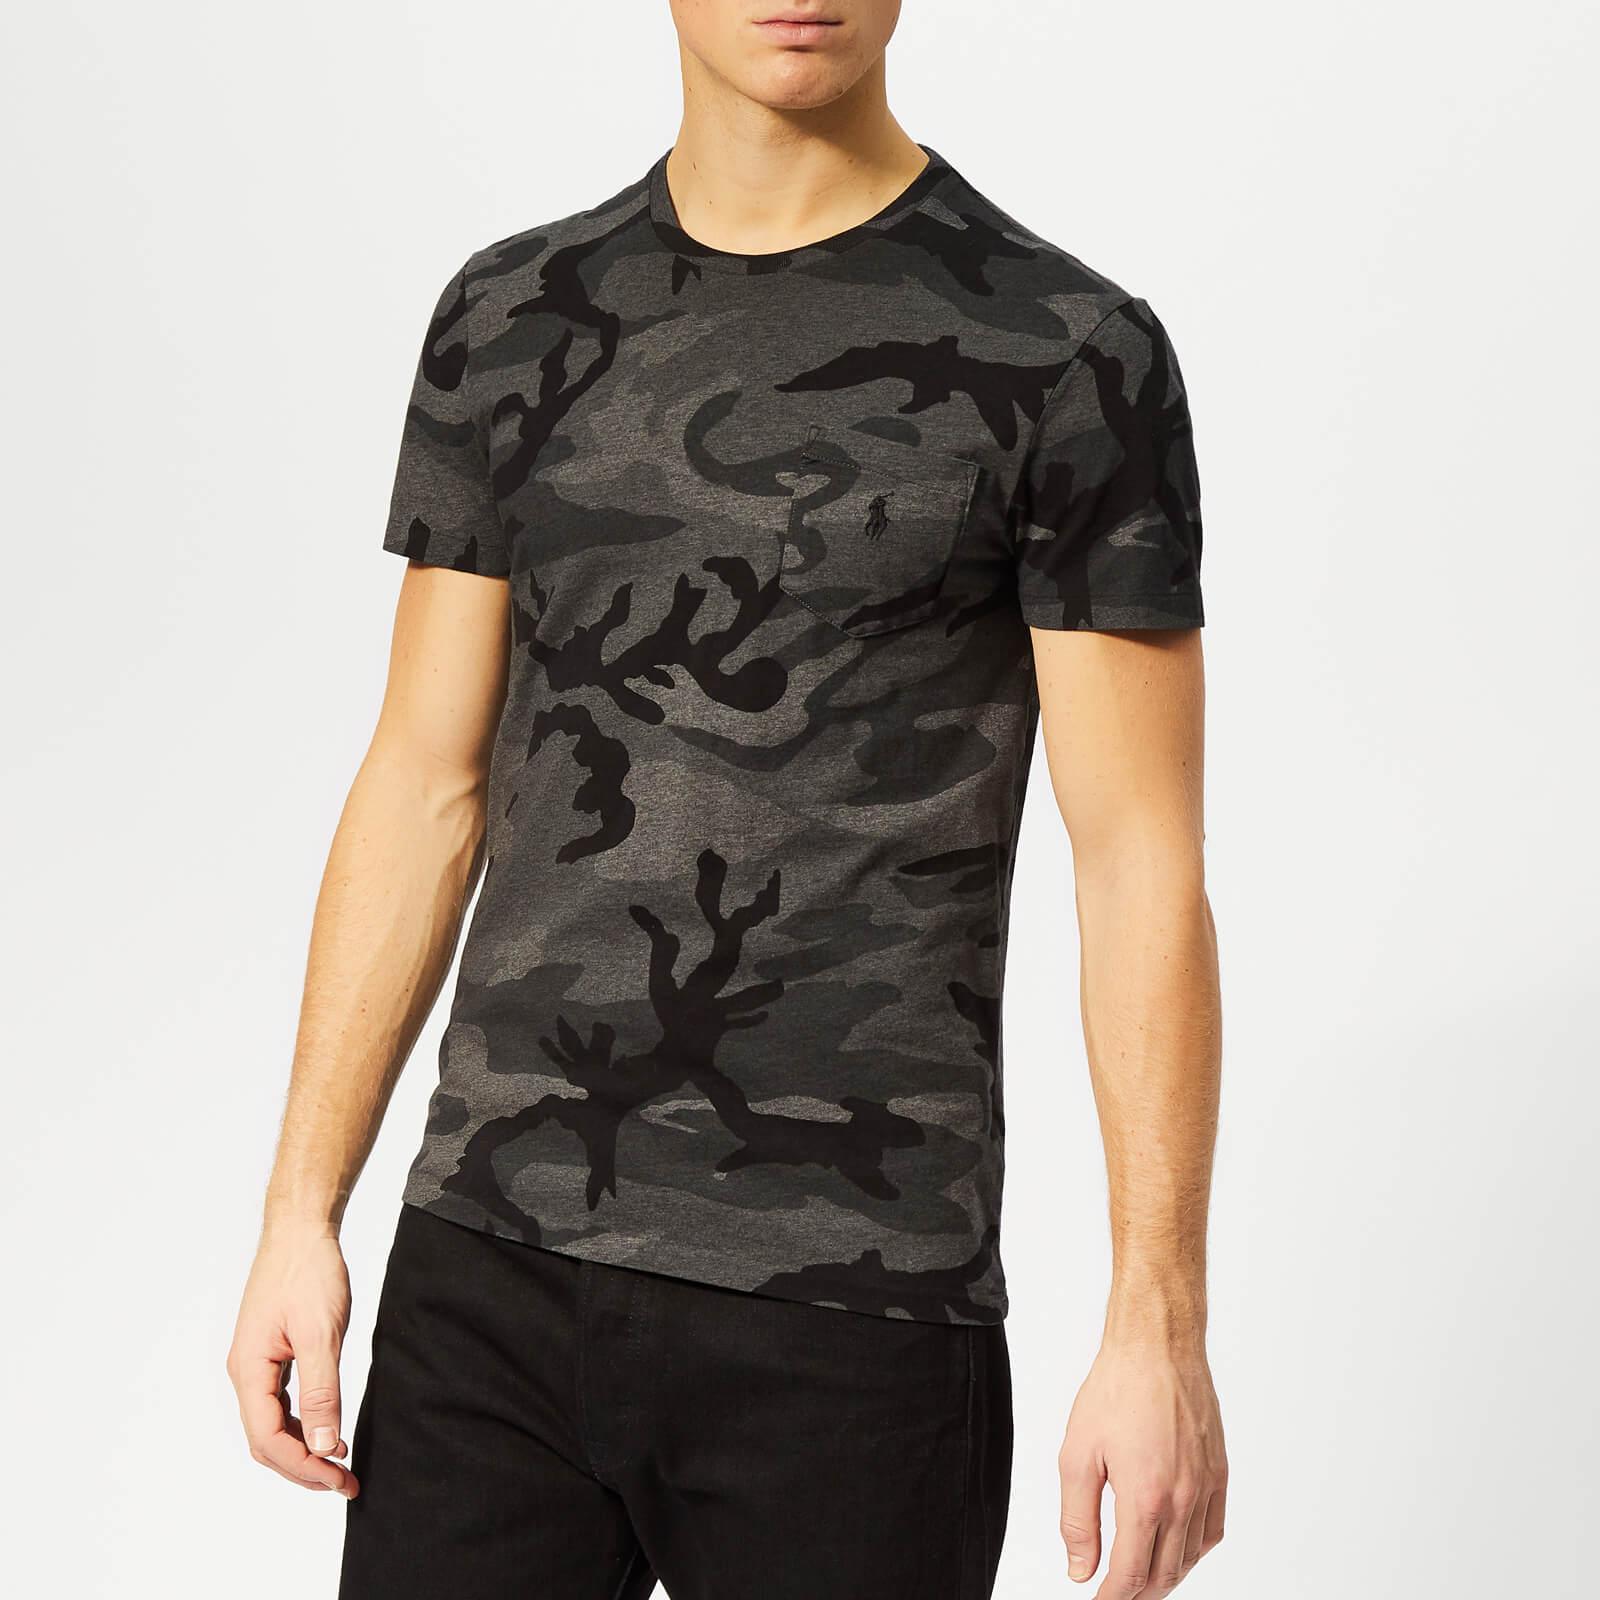 Cotton Jersey Ralph Charcoal Rl Camo T Shirt Lauren Polo Men's EDIYW2H9